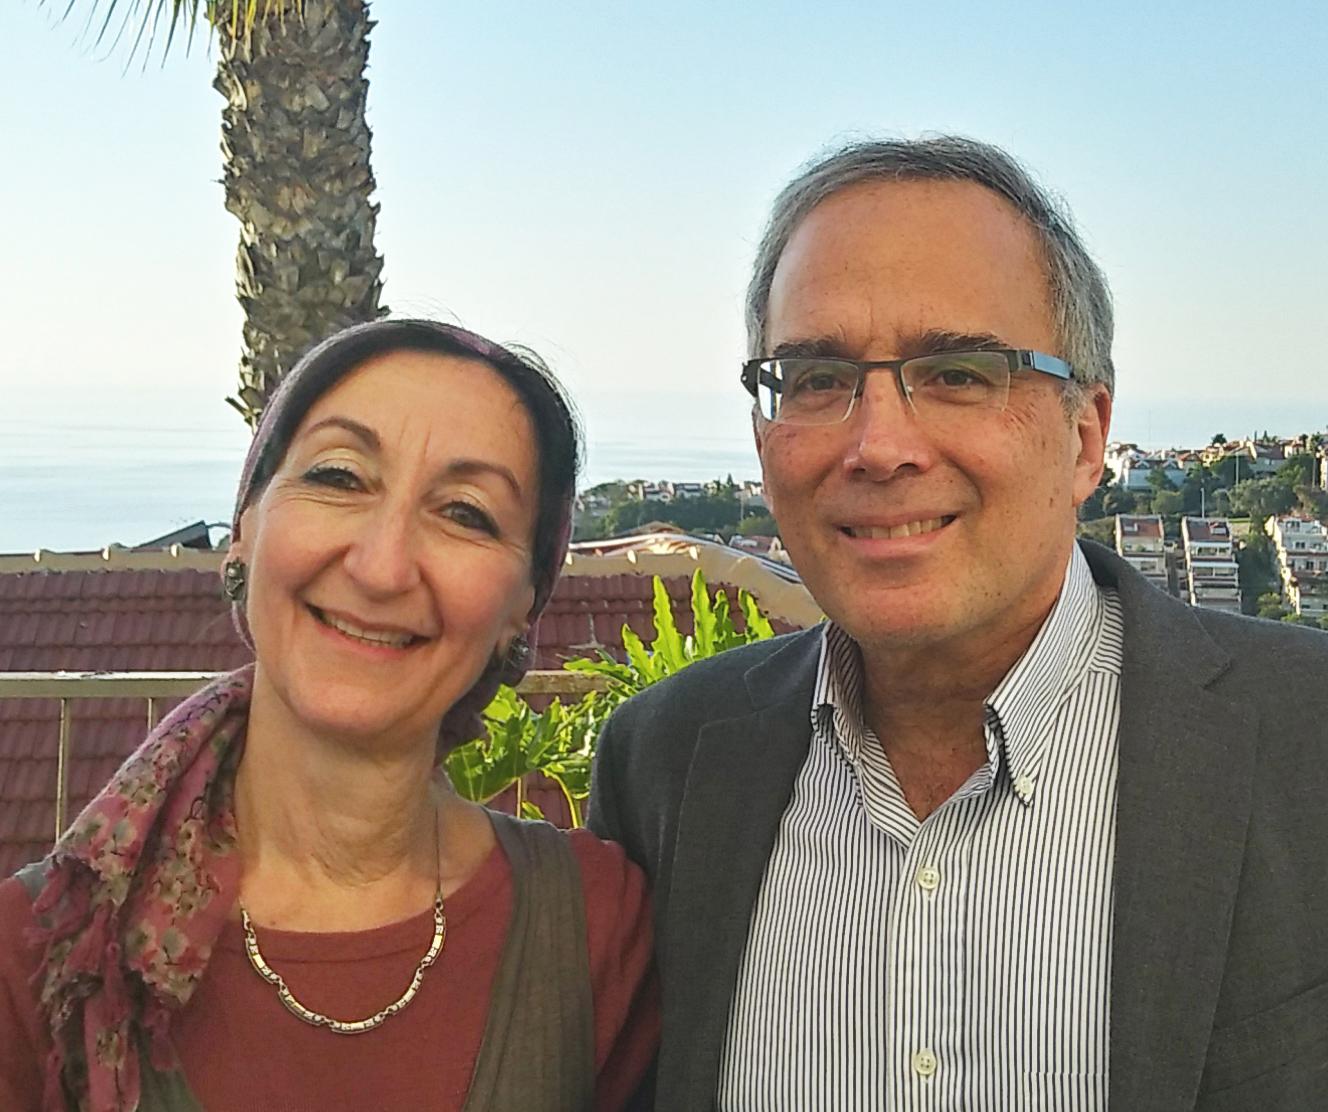 Jeanette and Professor Ross Pinsky